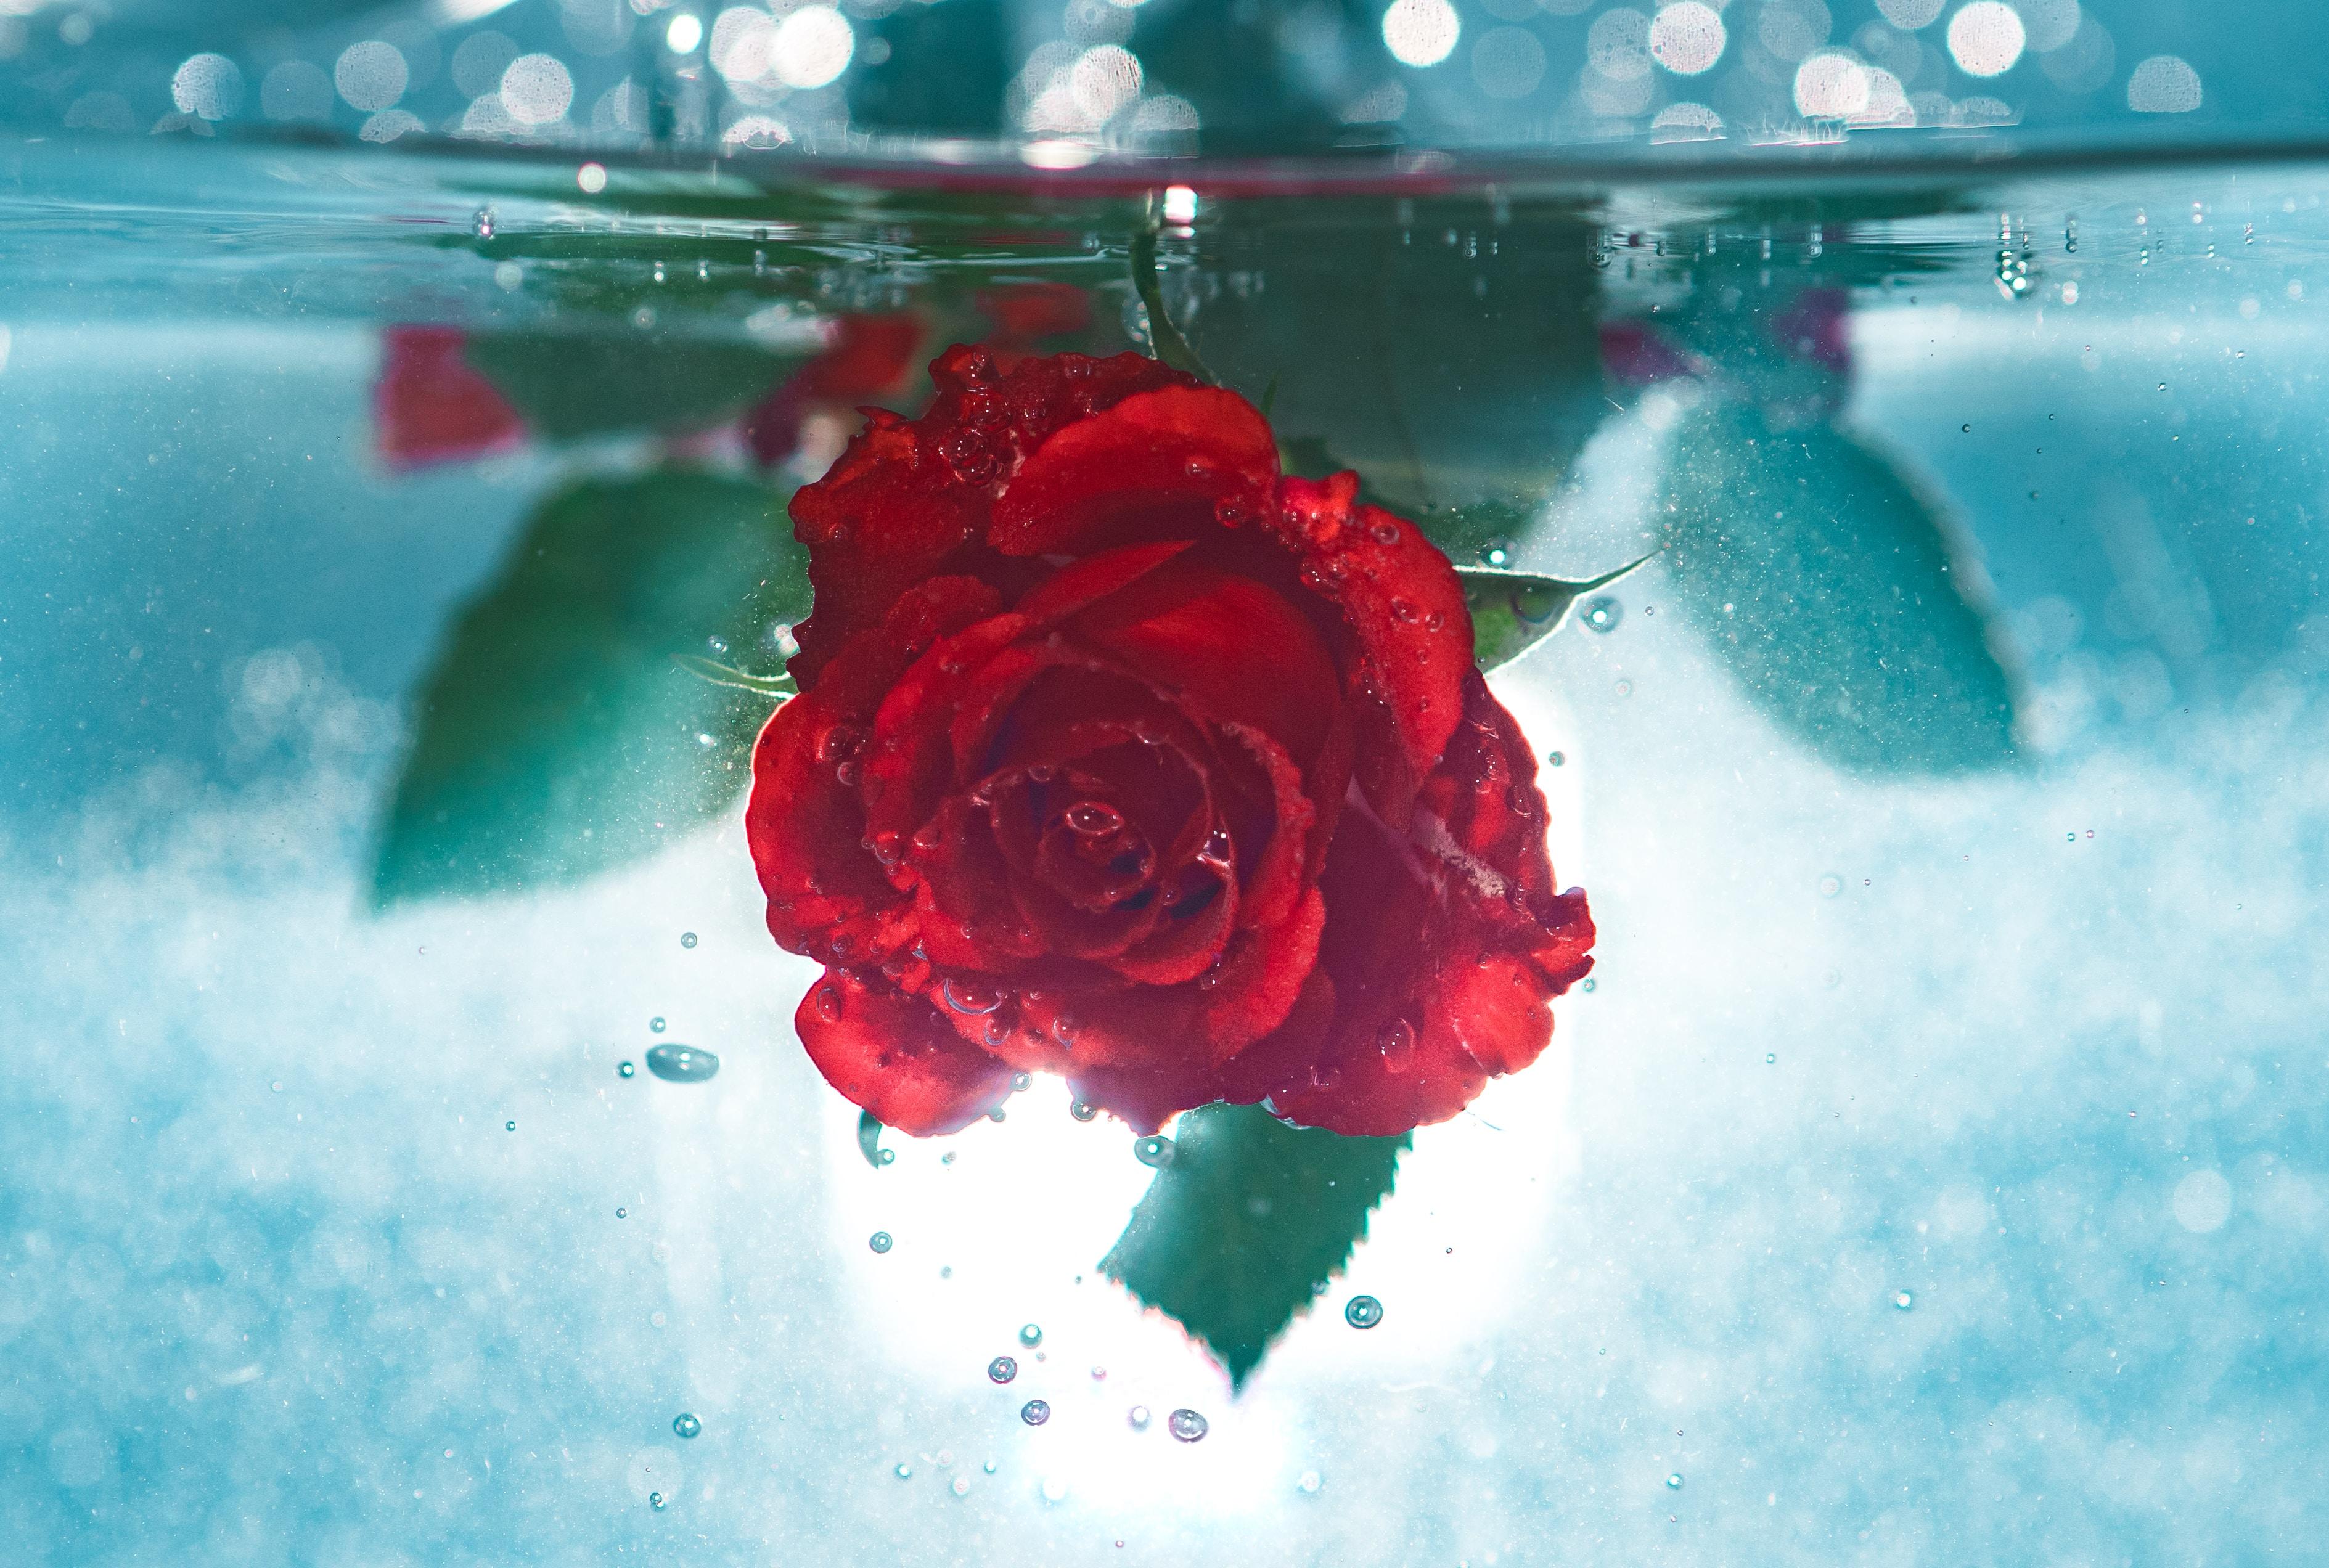 red rose underwater